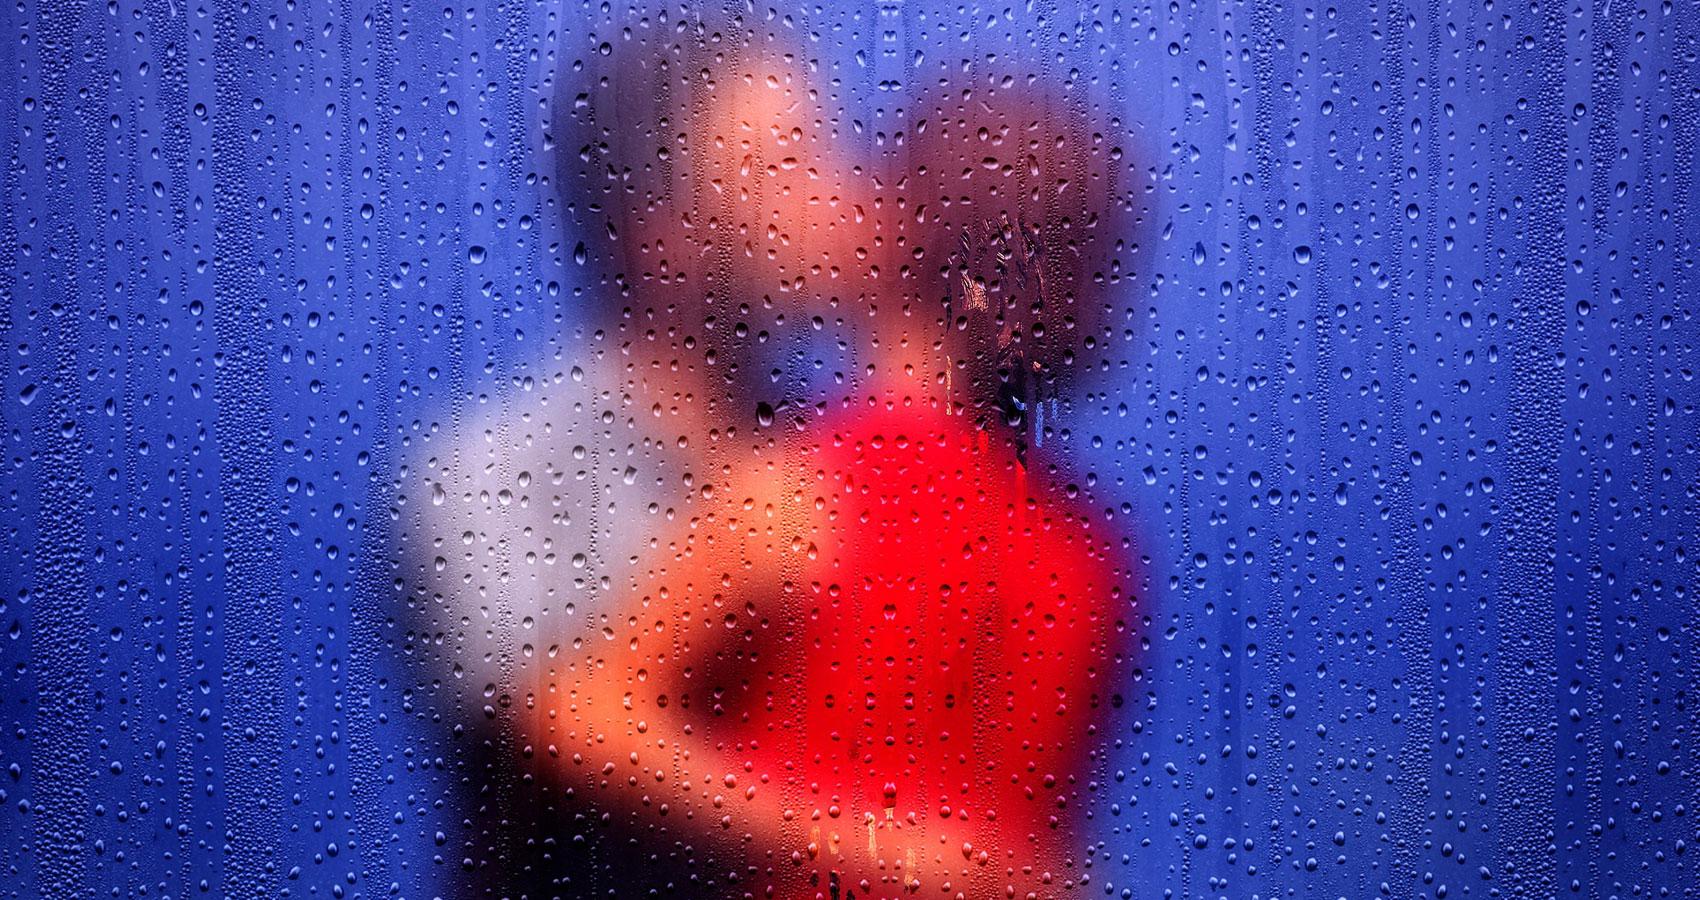 Je t'aime infinitement by Sofia Kioroglou at Spillwords.com